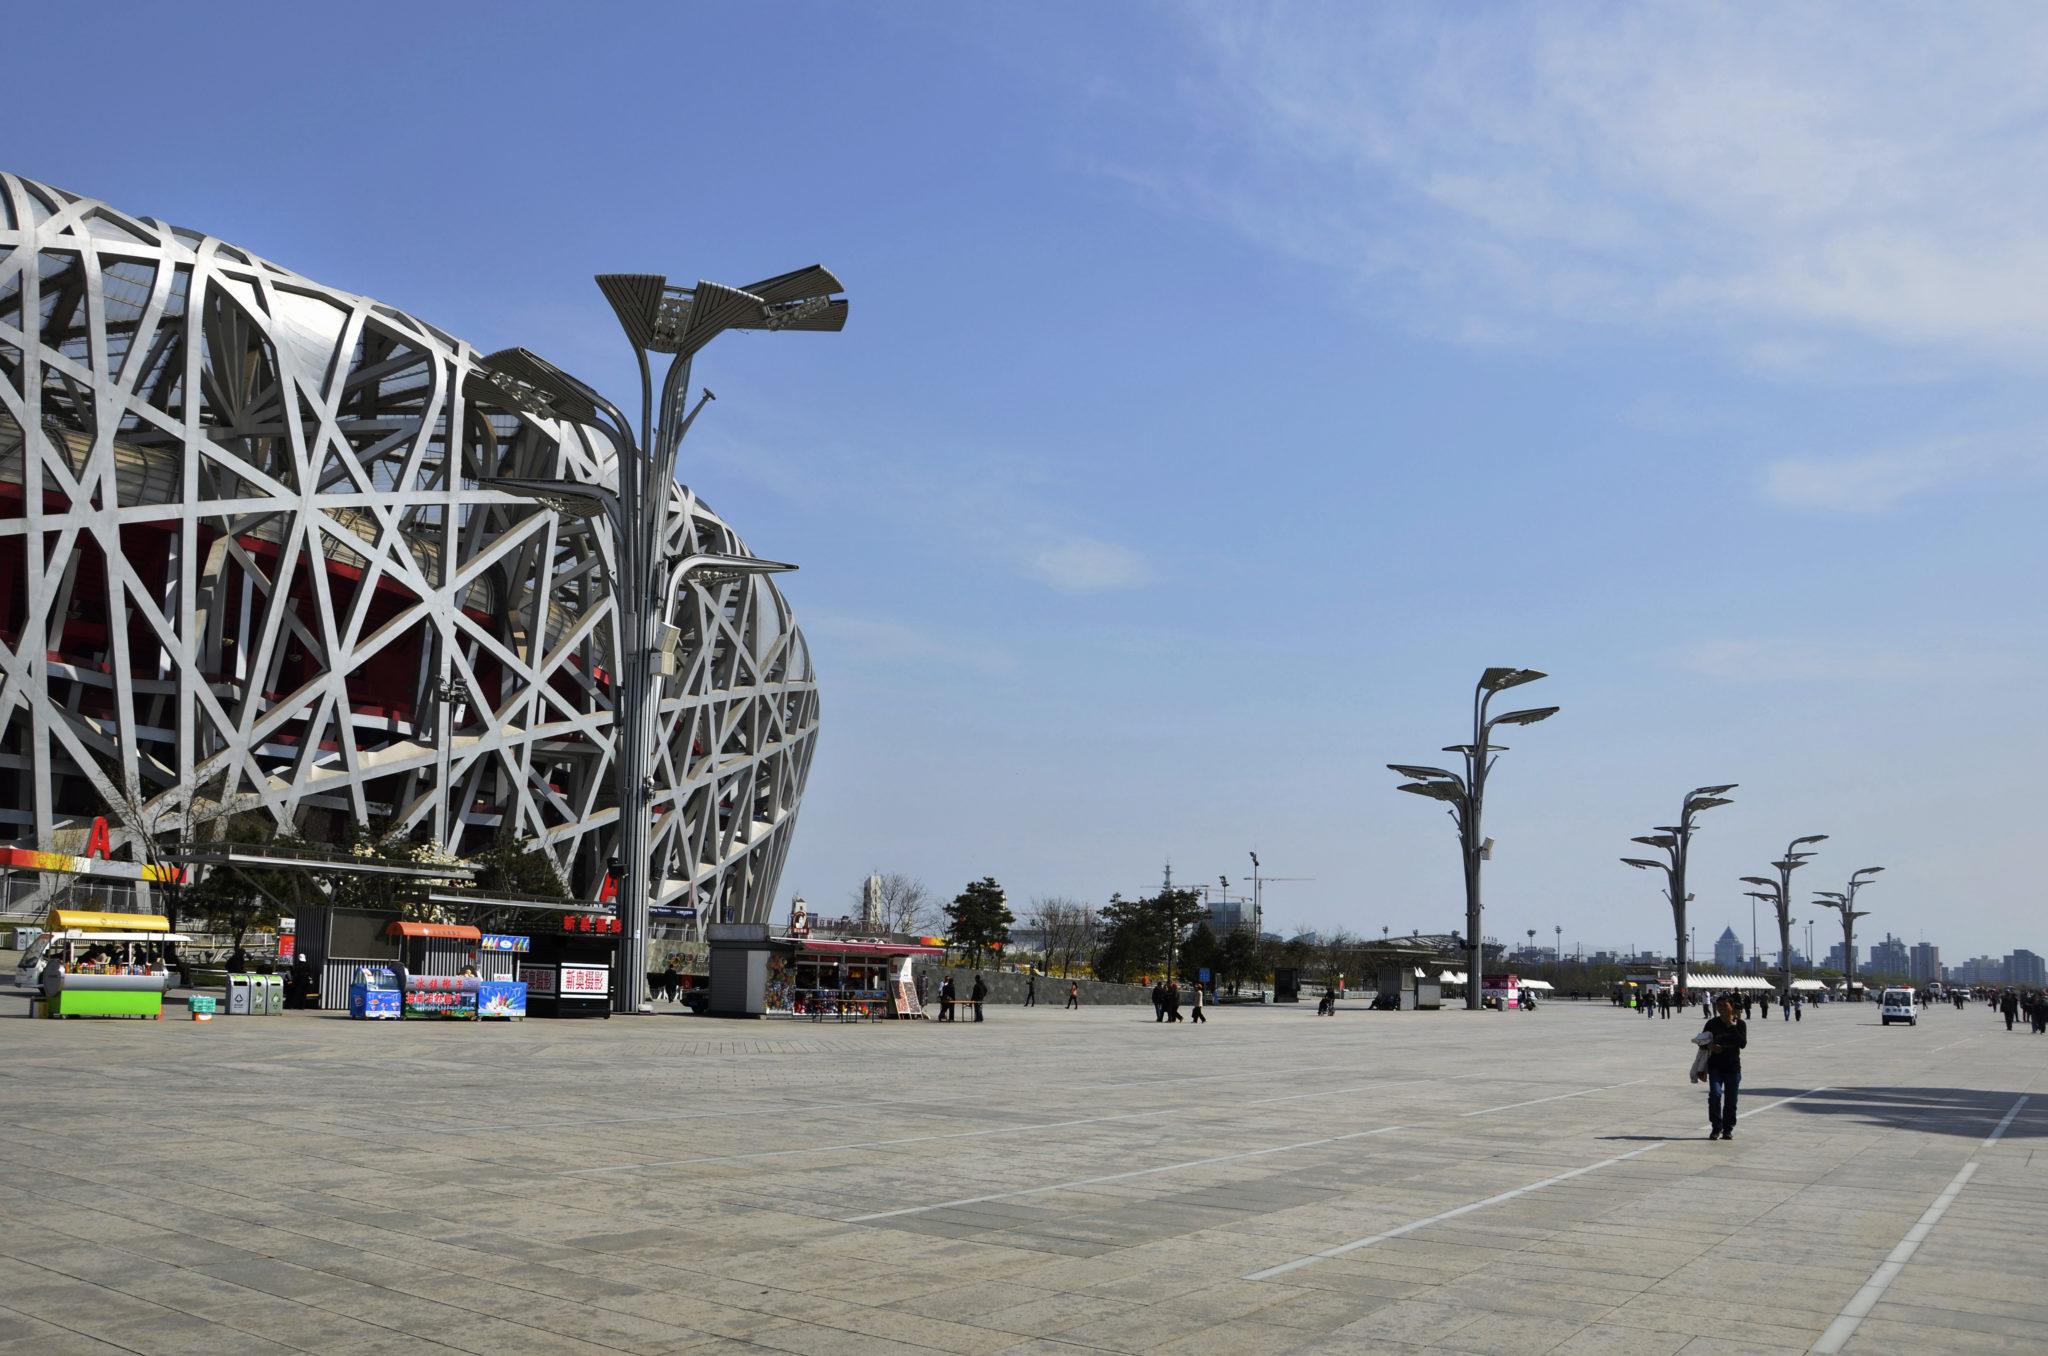 Beijing Olympic Green Tennis Court Stock Photos & Beijing Olympic ...